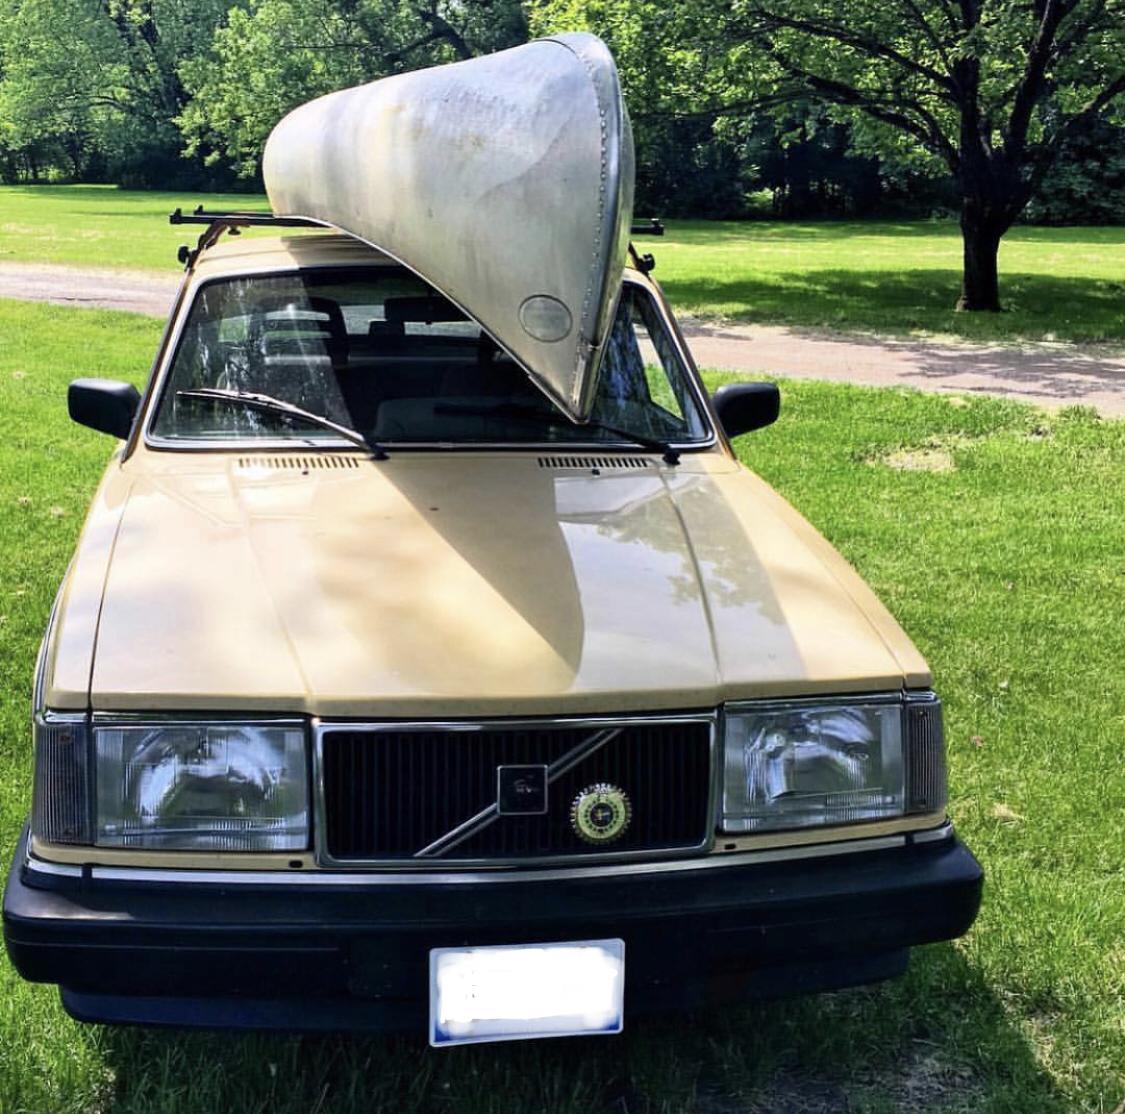 March - '86 Volvo 240 - UNDER RESTORATION - COMING SOON!